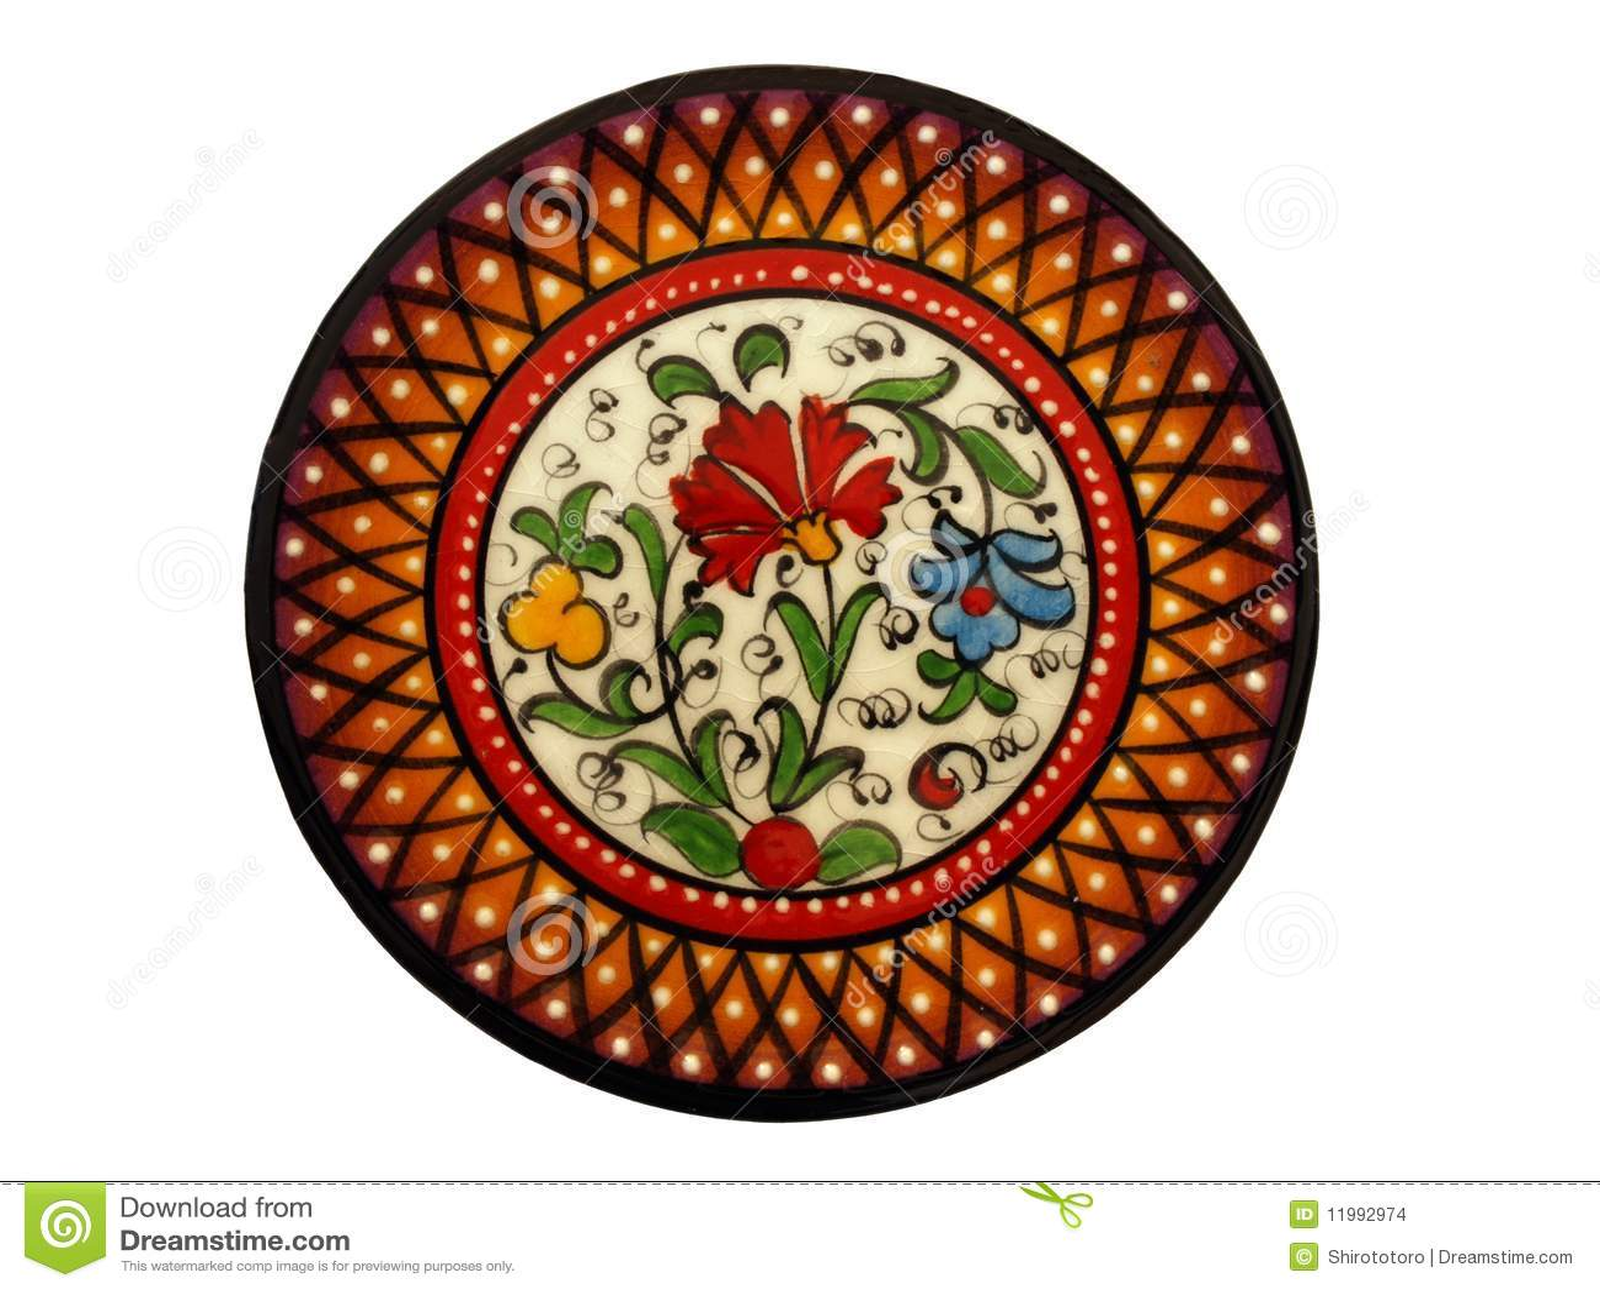 Spanish Hand Painted Plate